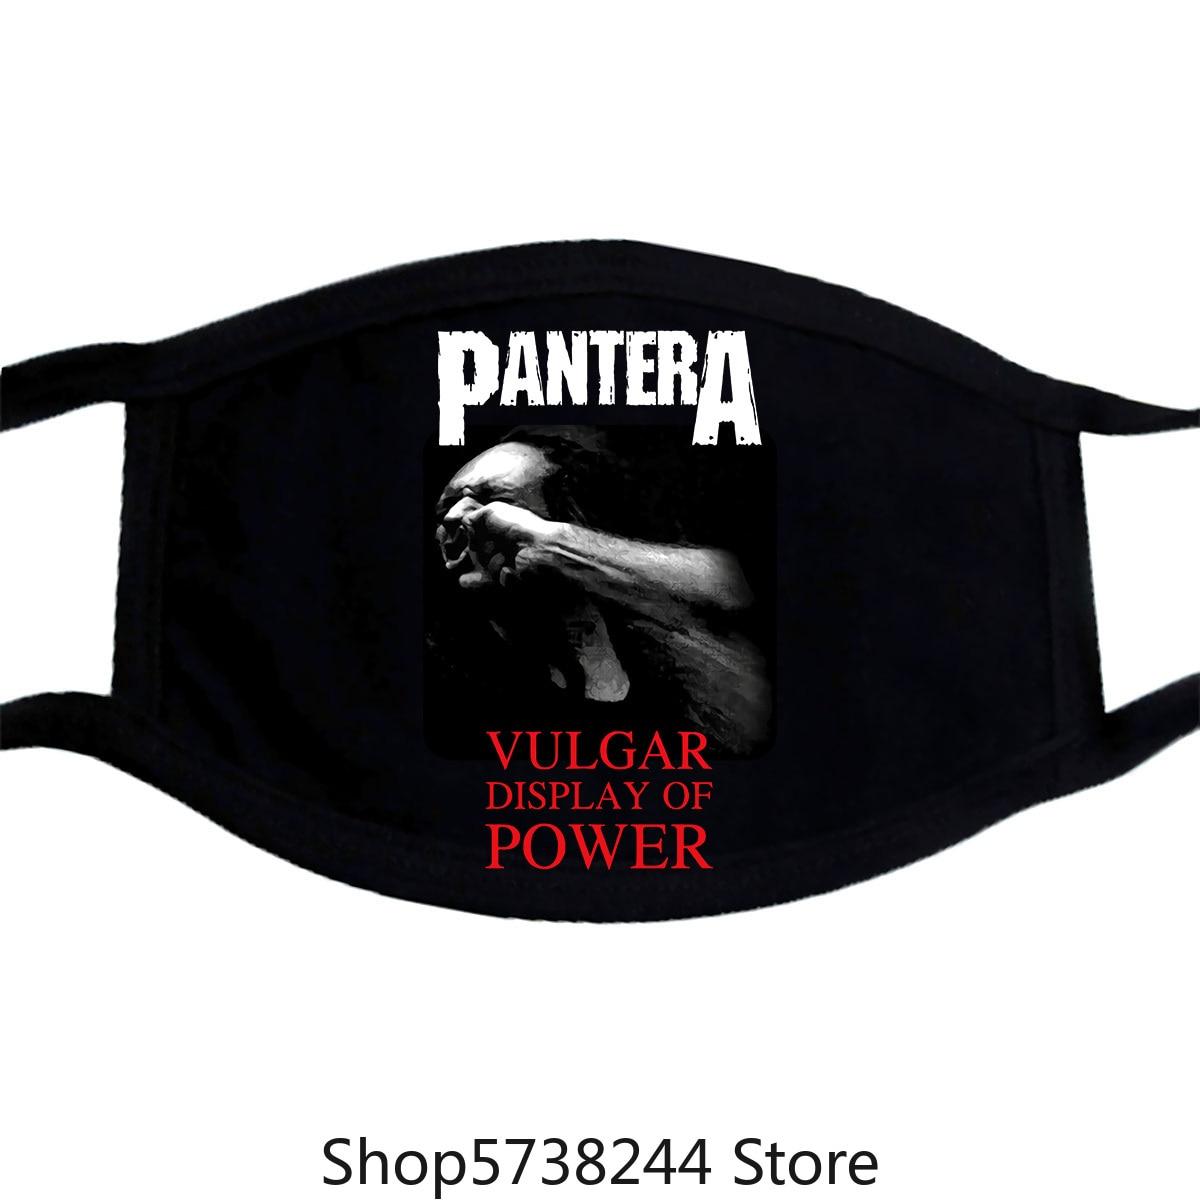 Pantera Vulgar Display Of Power V3 Mask Heavy Metal Black Xs.3Xl Washable Reusable Mask With